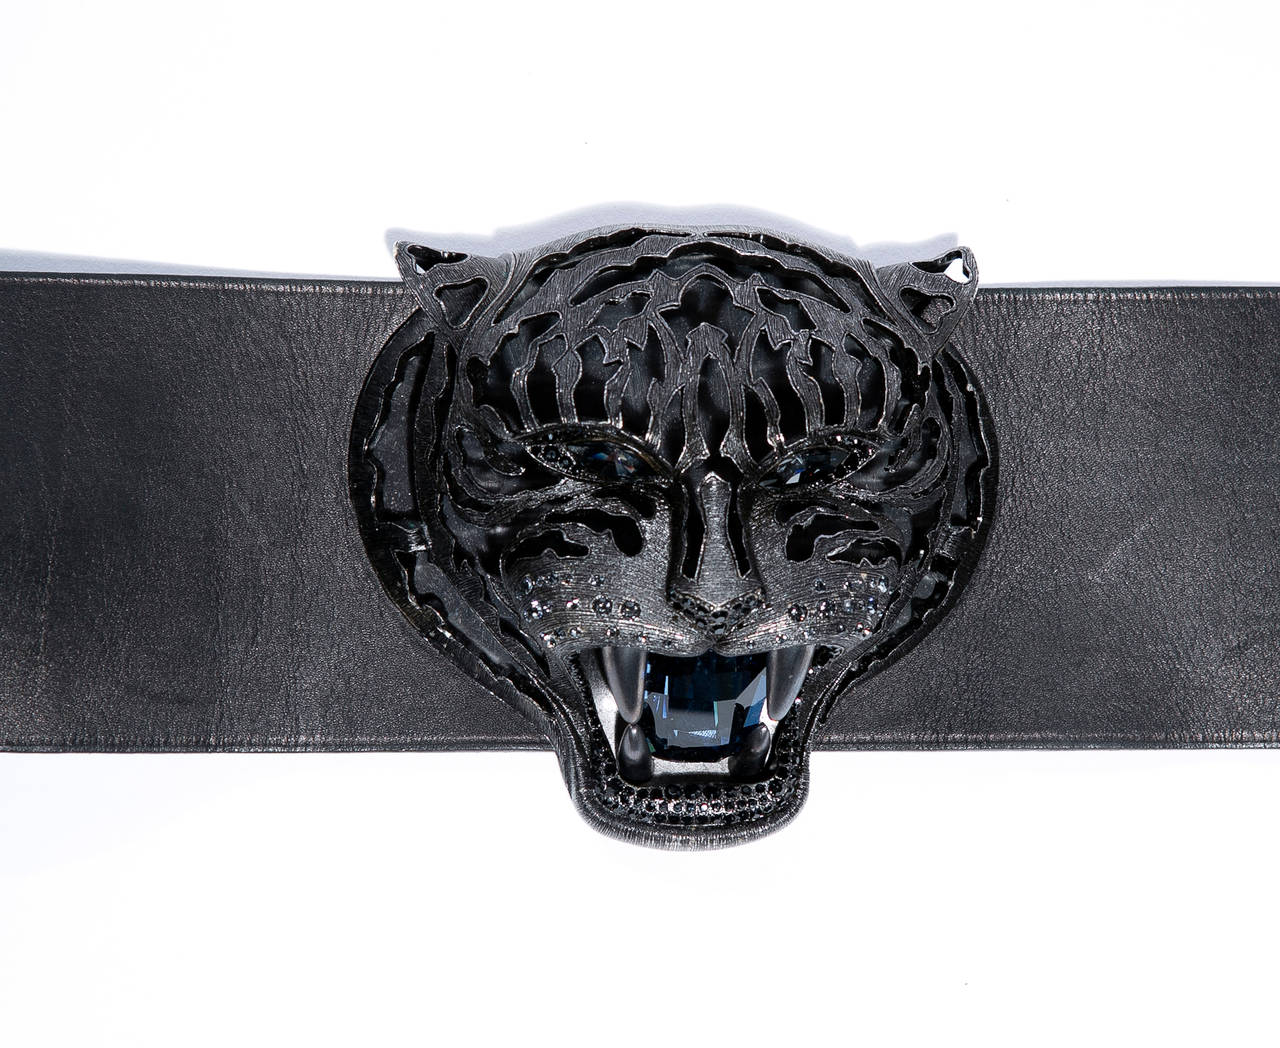 Women's   Alber Elbaz for Lanvin Runway Black Leather Braided Pandora Belt, Fall 2012 For Sale